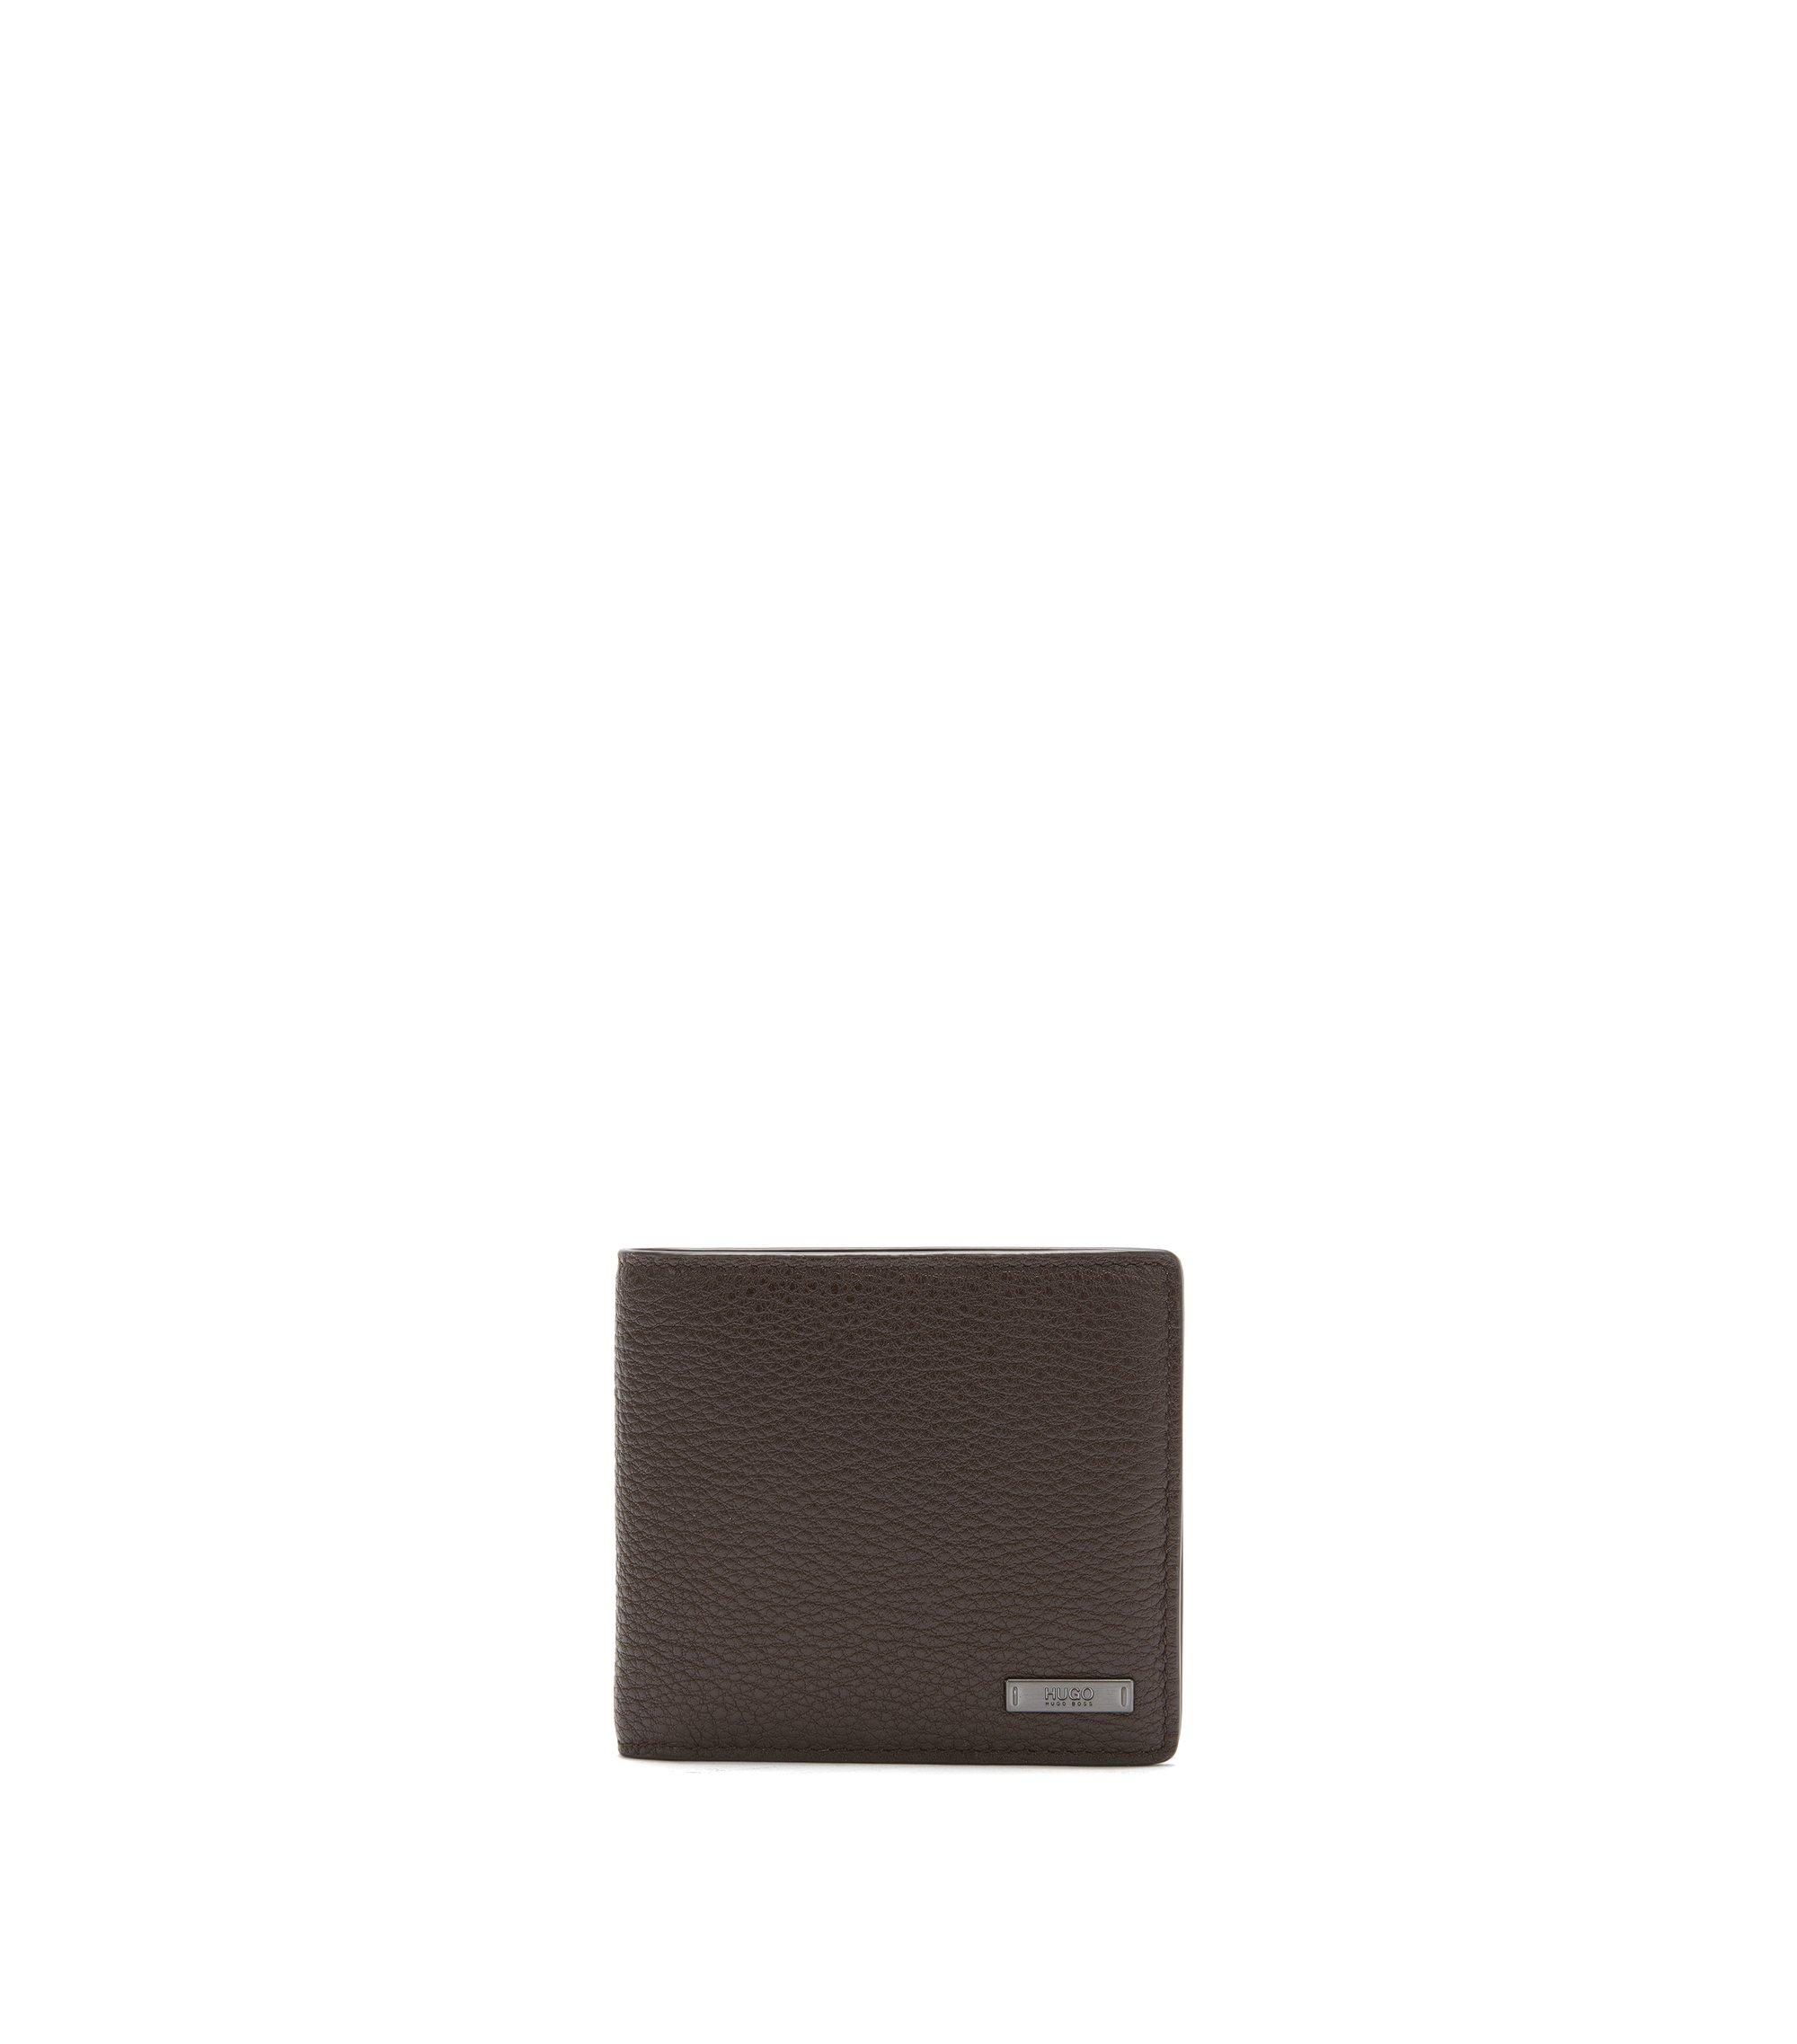 Openklapbare portemonnee van generfd rundleer, Donkerbruin